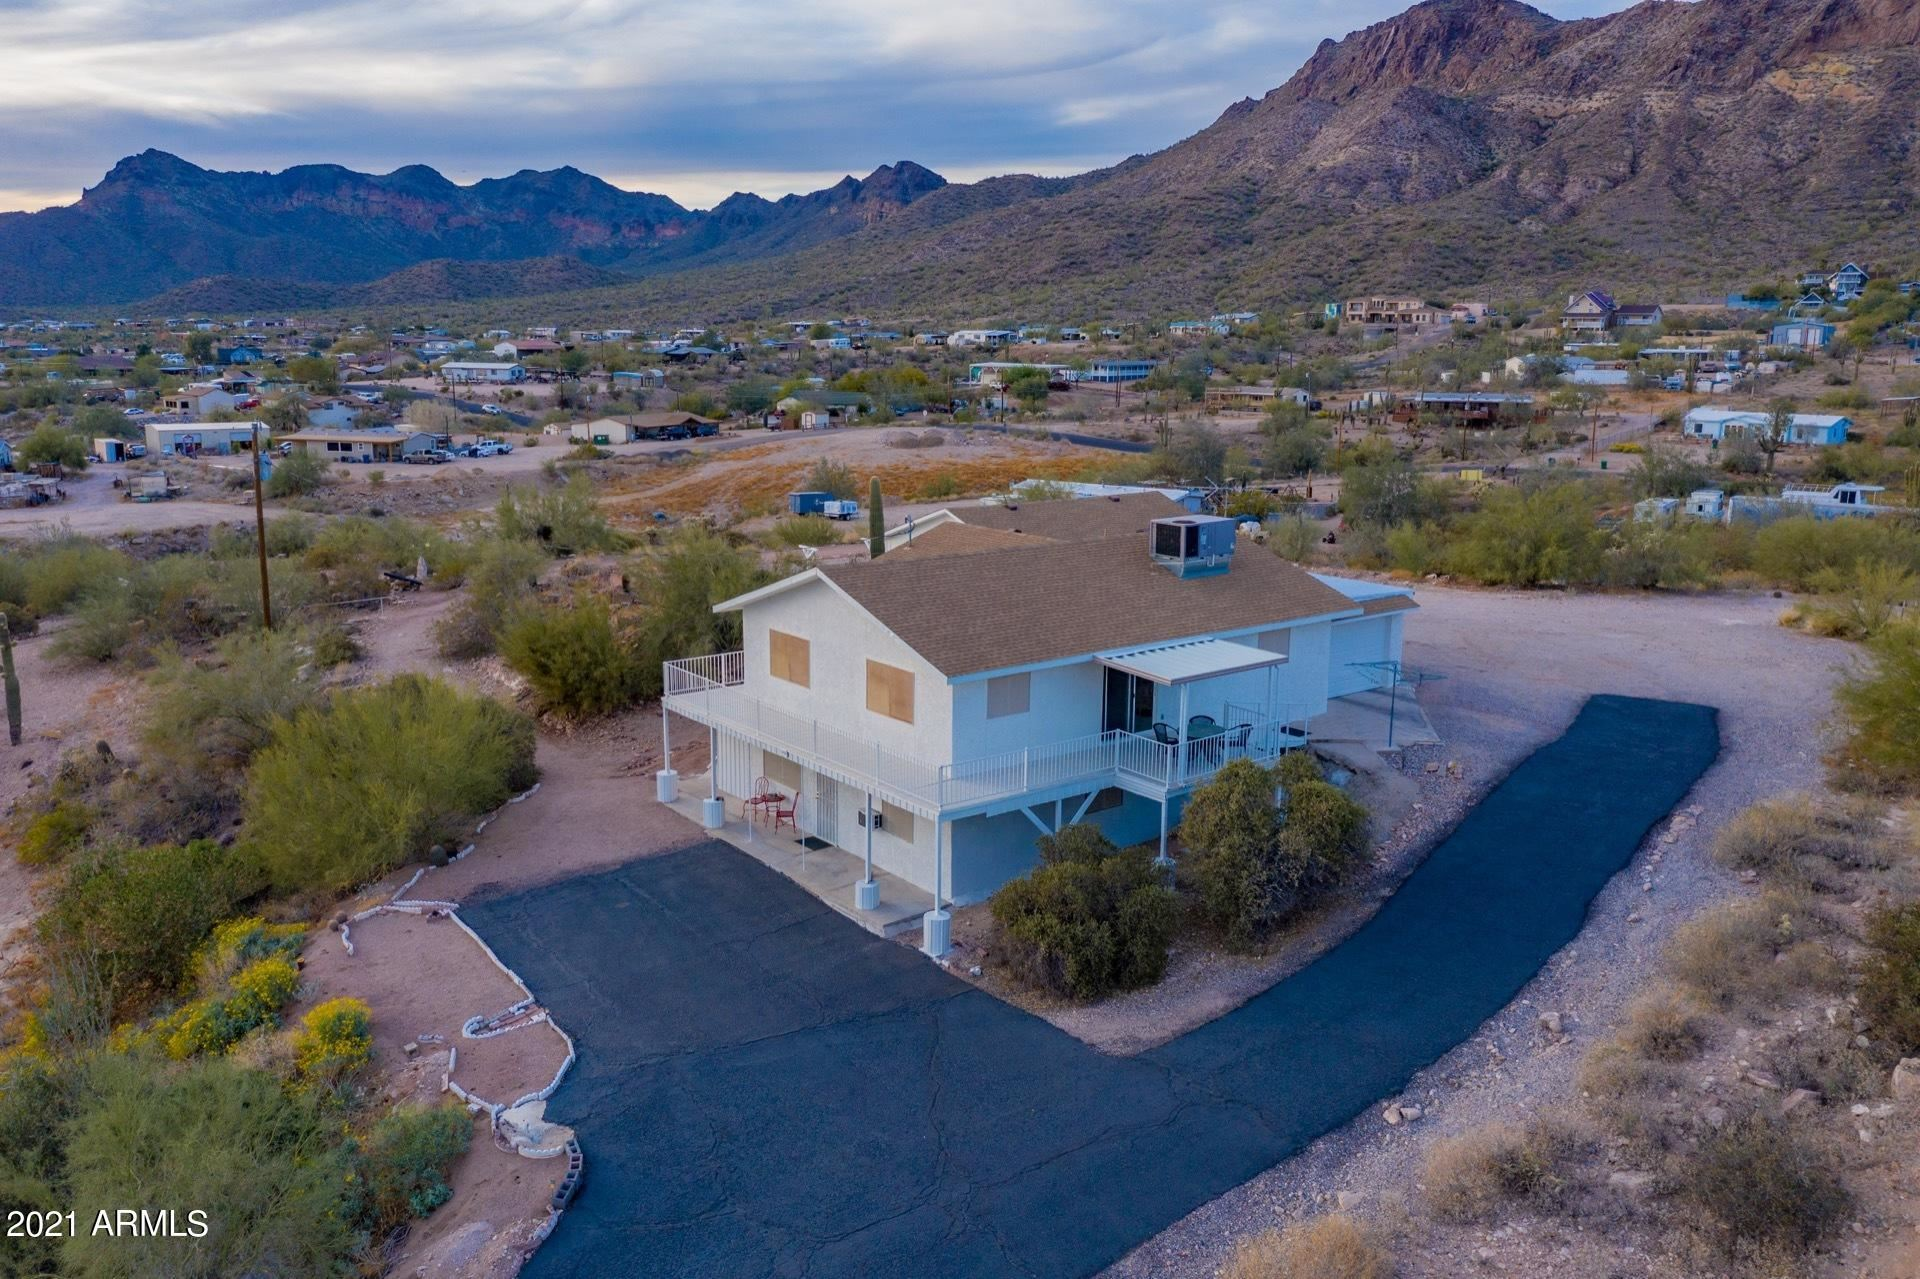 Photo of 1094 W MOON VISTA Street, Apache Junction, AZ 85120 (MLS # 6202251)